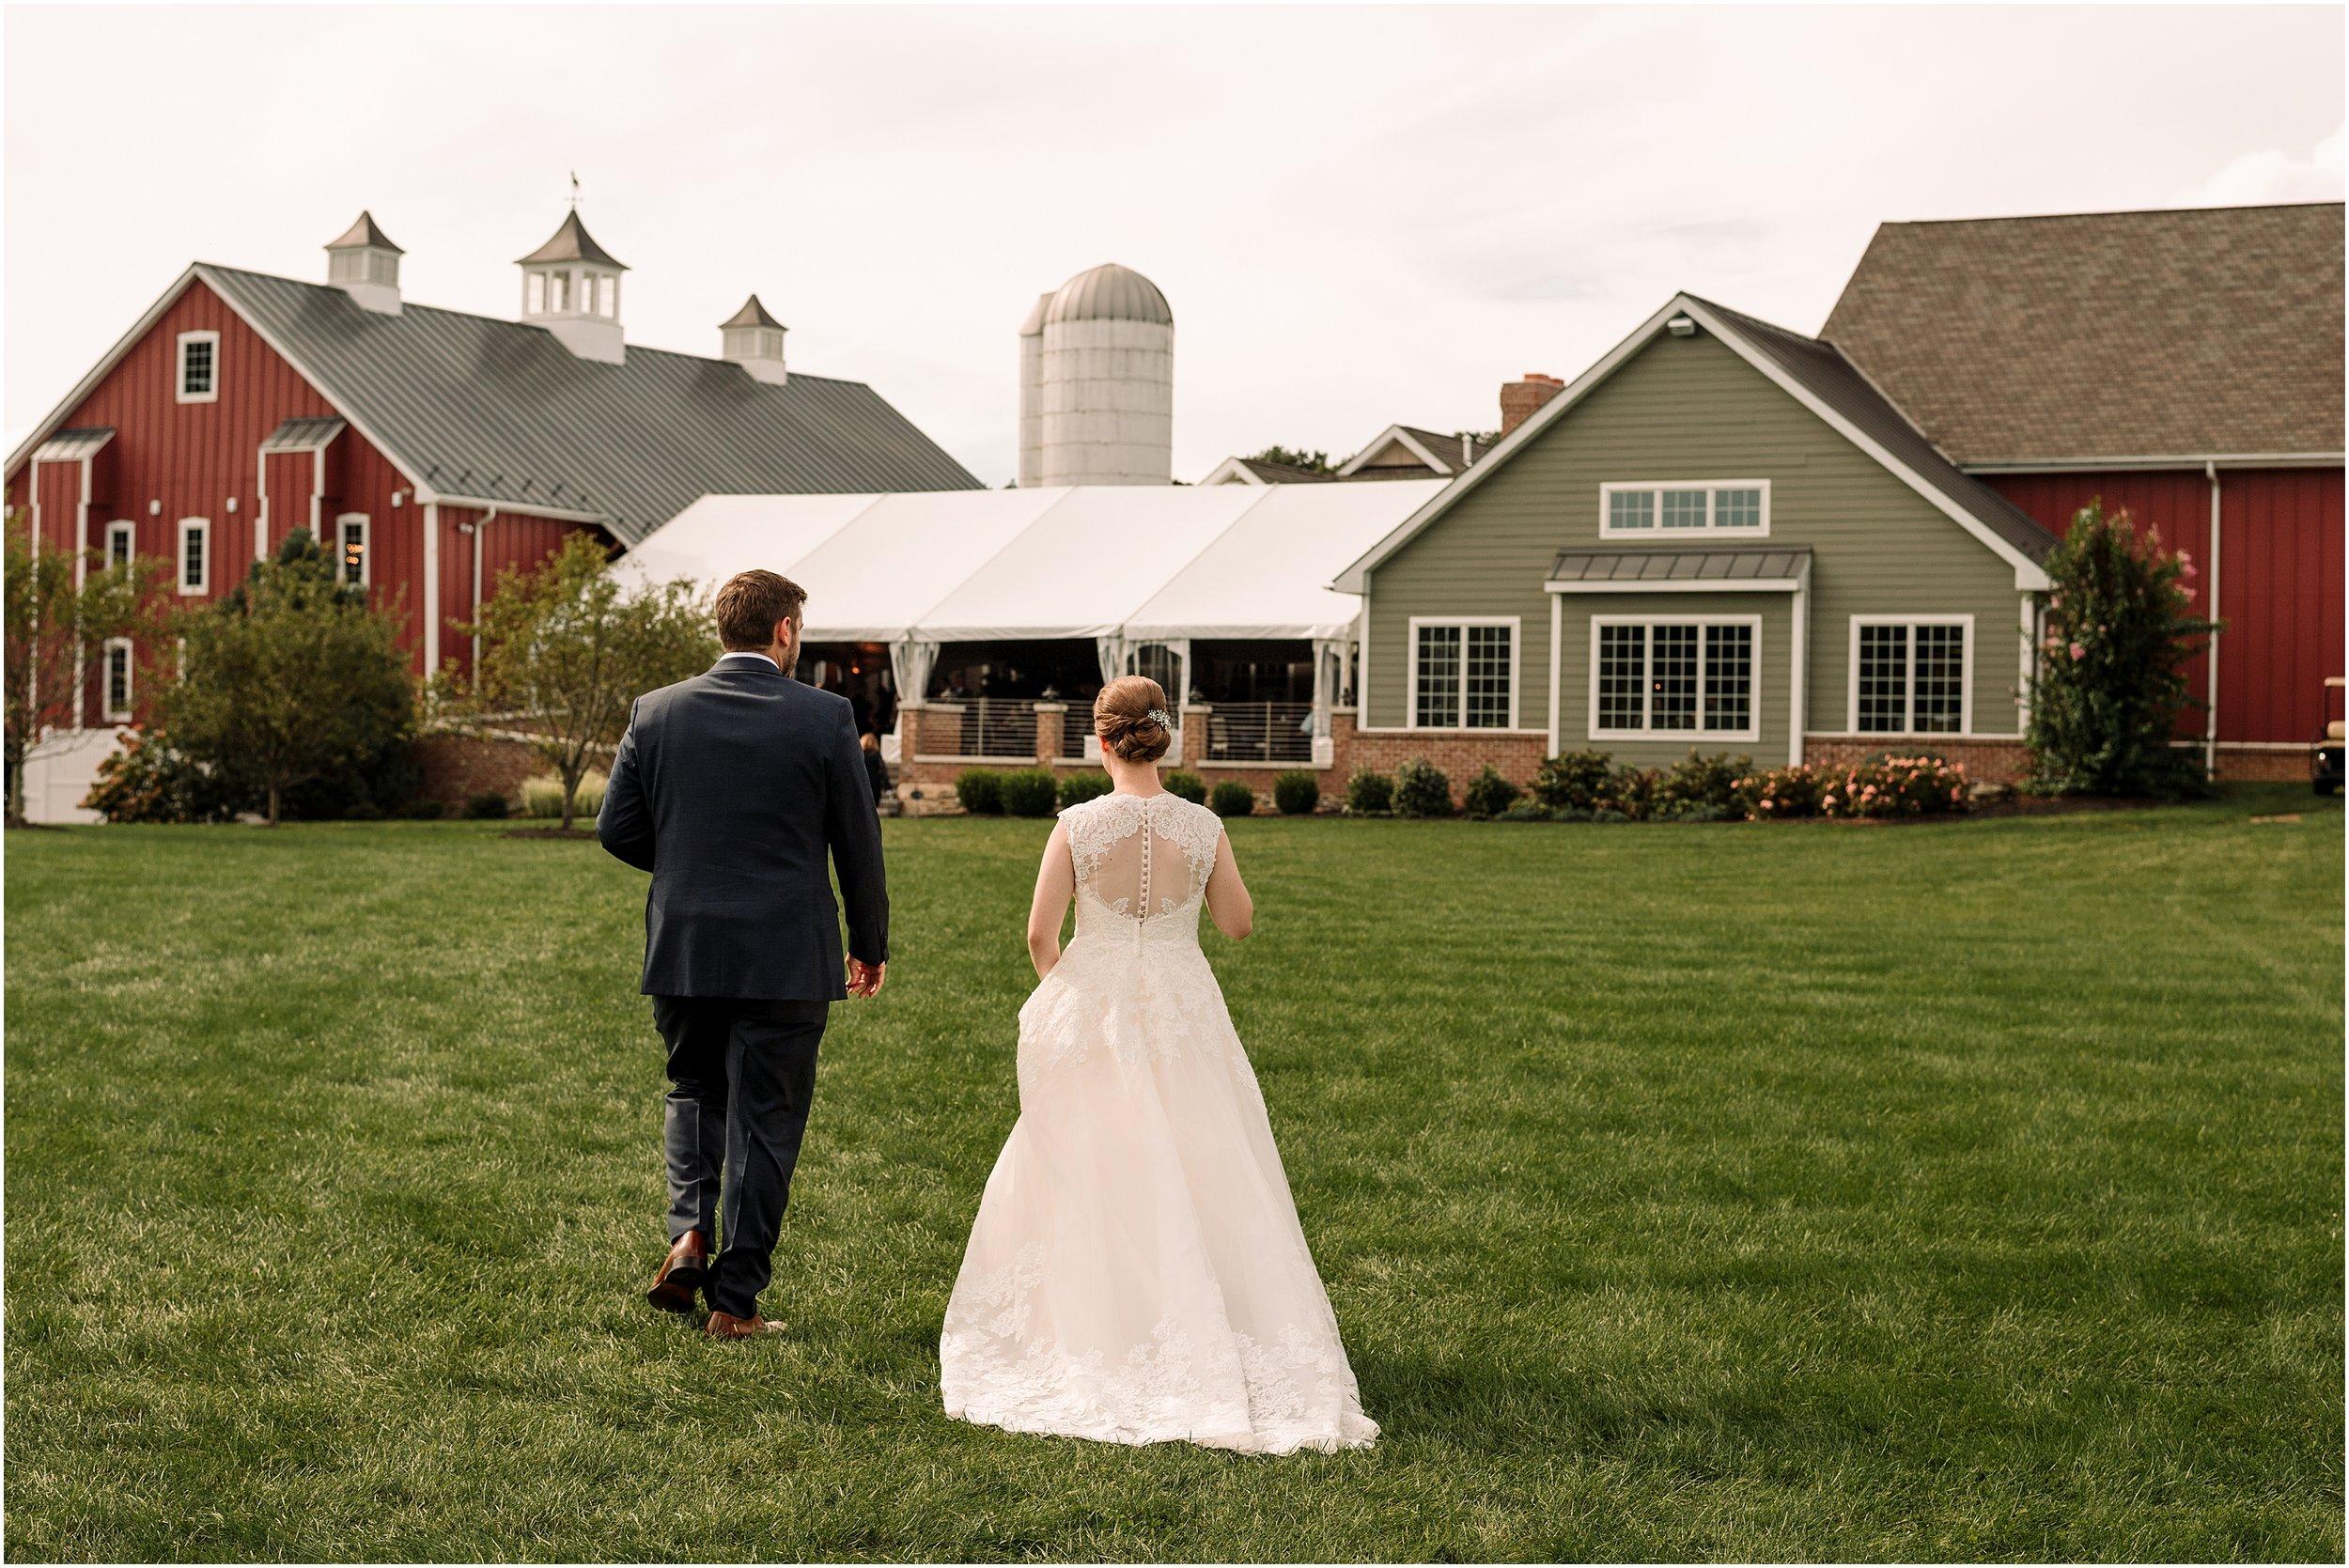 hannah leigh photography Wyndridge Farm Wedding York PA_1534.jpg